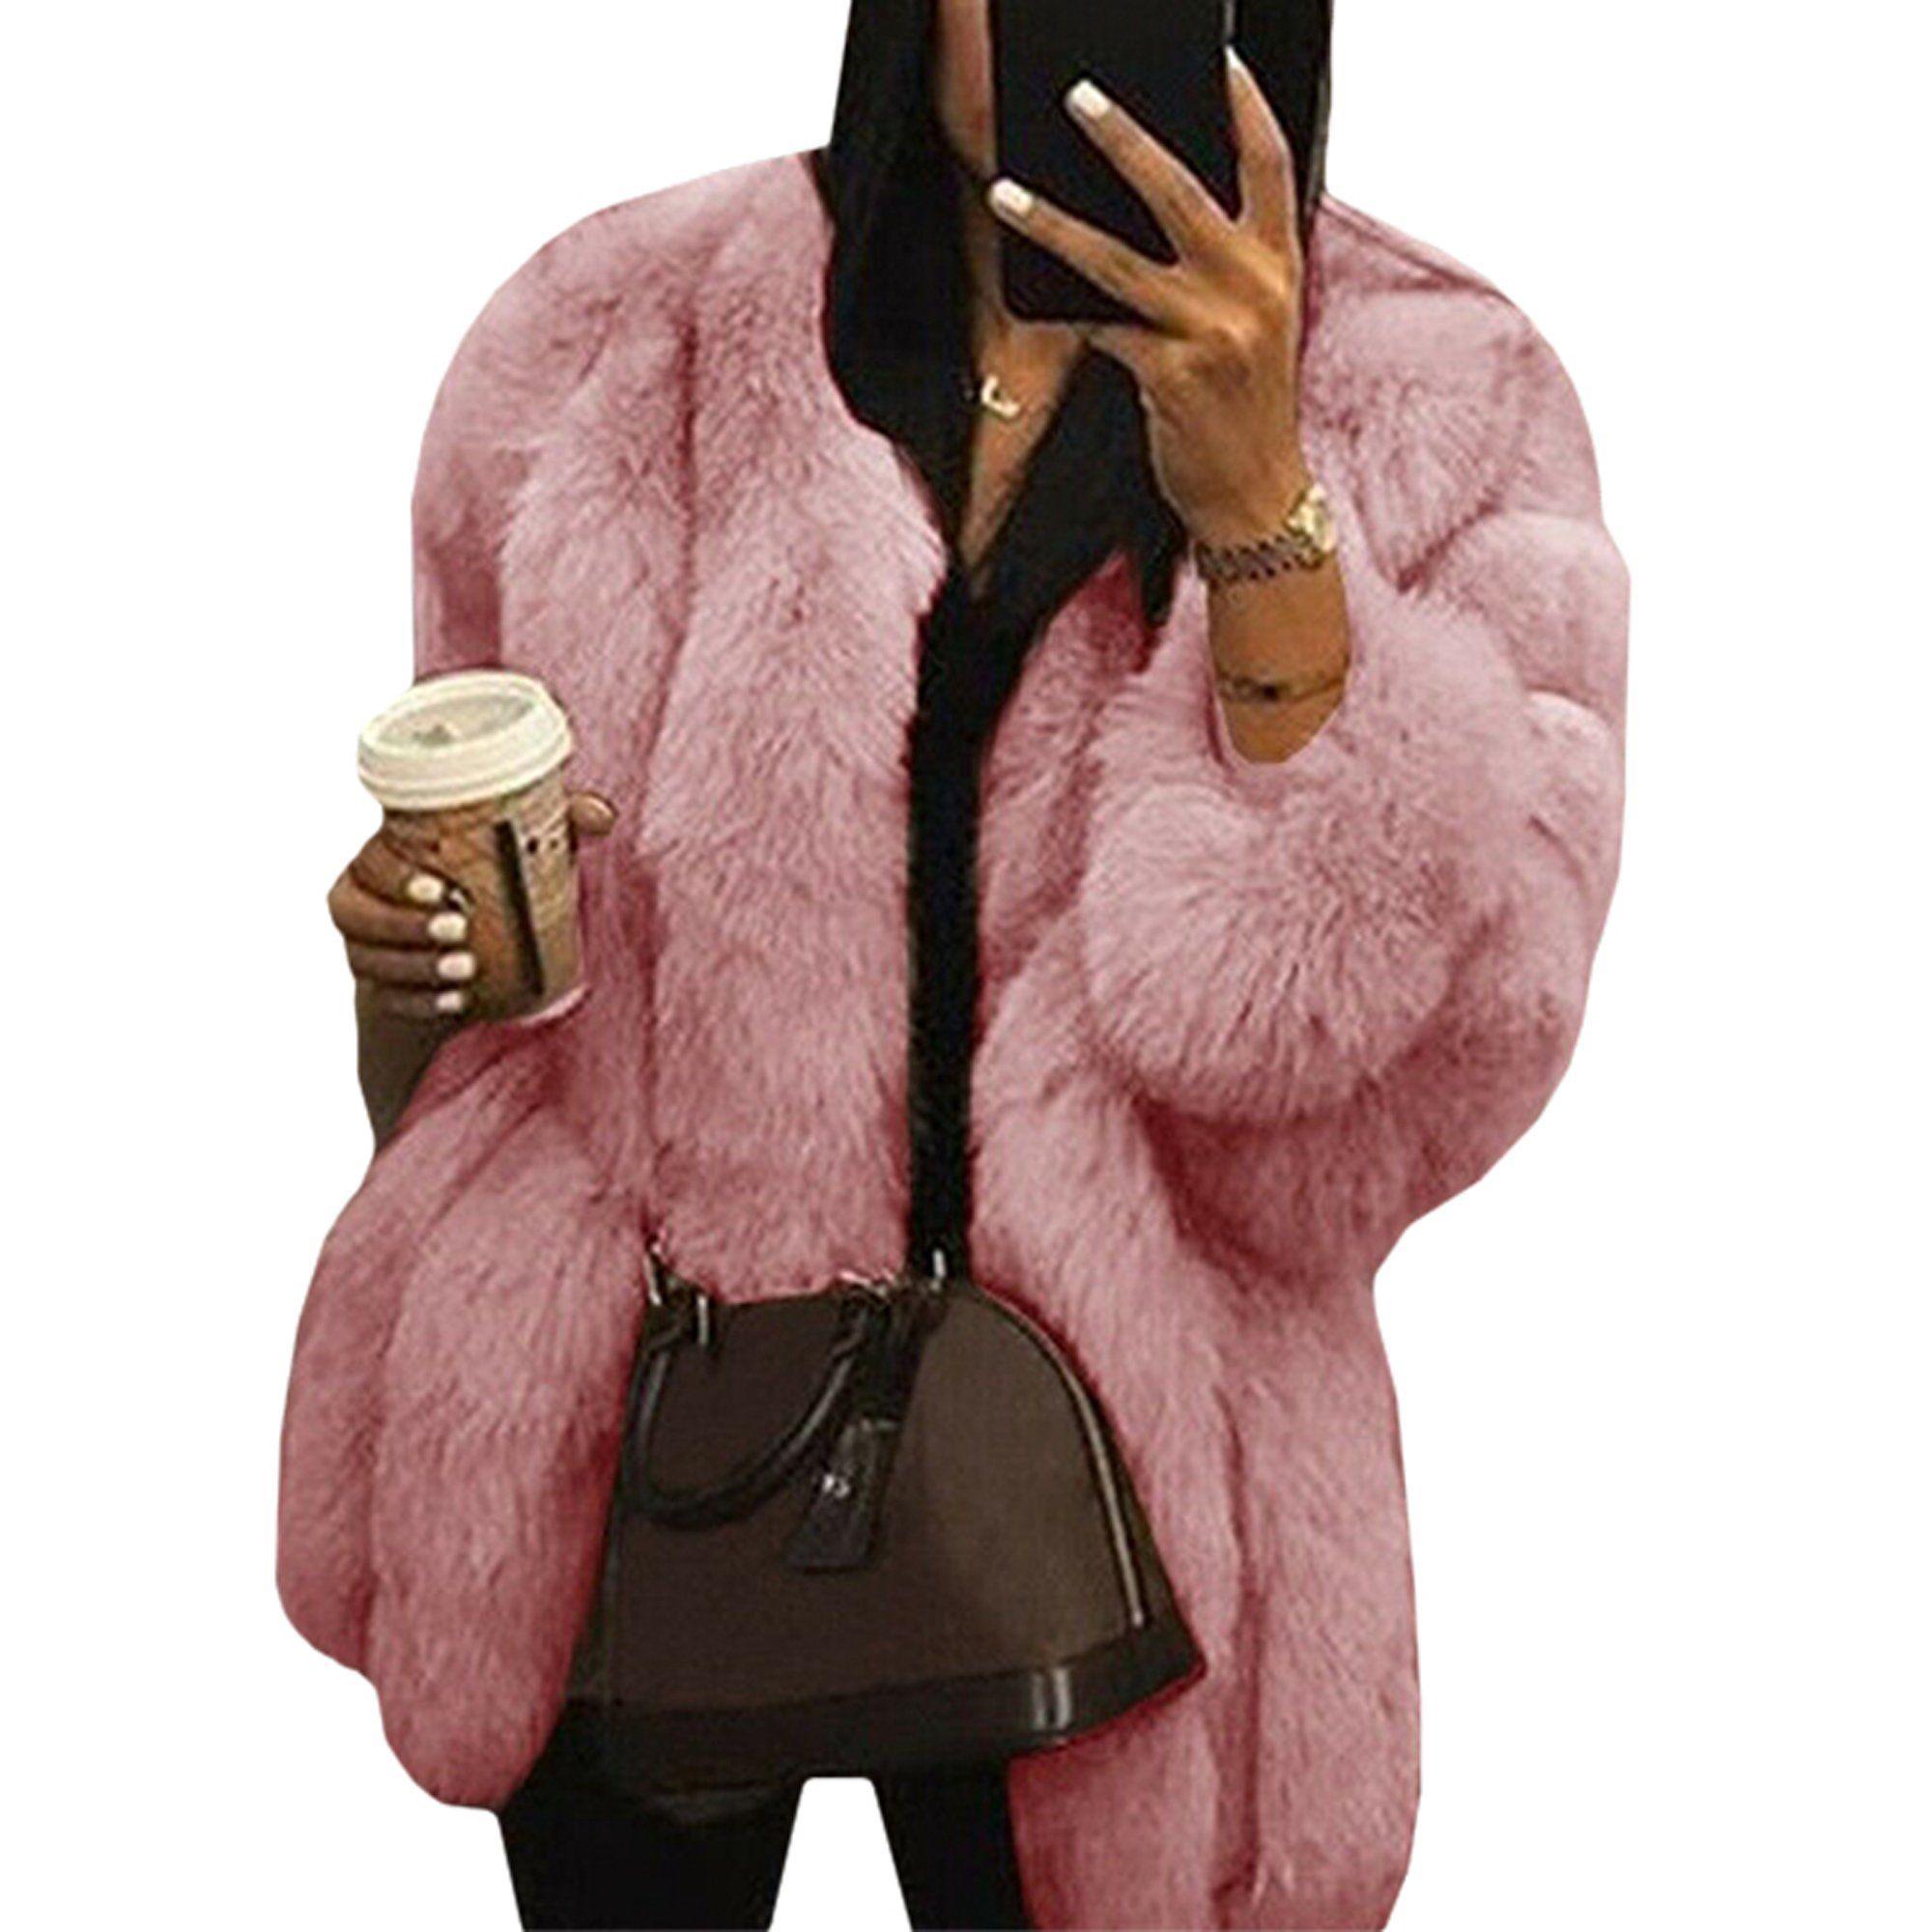 Wodstyle Women S Faux Fur Jacket Coat Winter Warm Thick Party Fluffy Tops Plus Size Walmart Com Faux Fur Jackets Women Fur Coats Women Fur Casual [ 2000 x 2000 Pixel ]